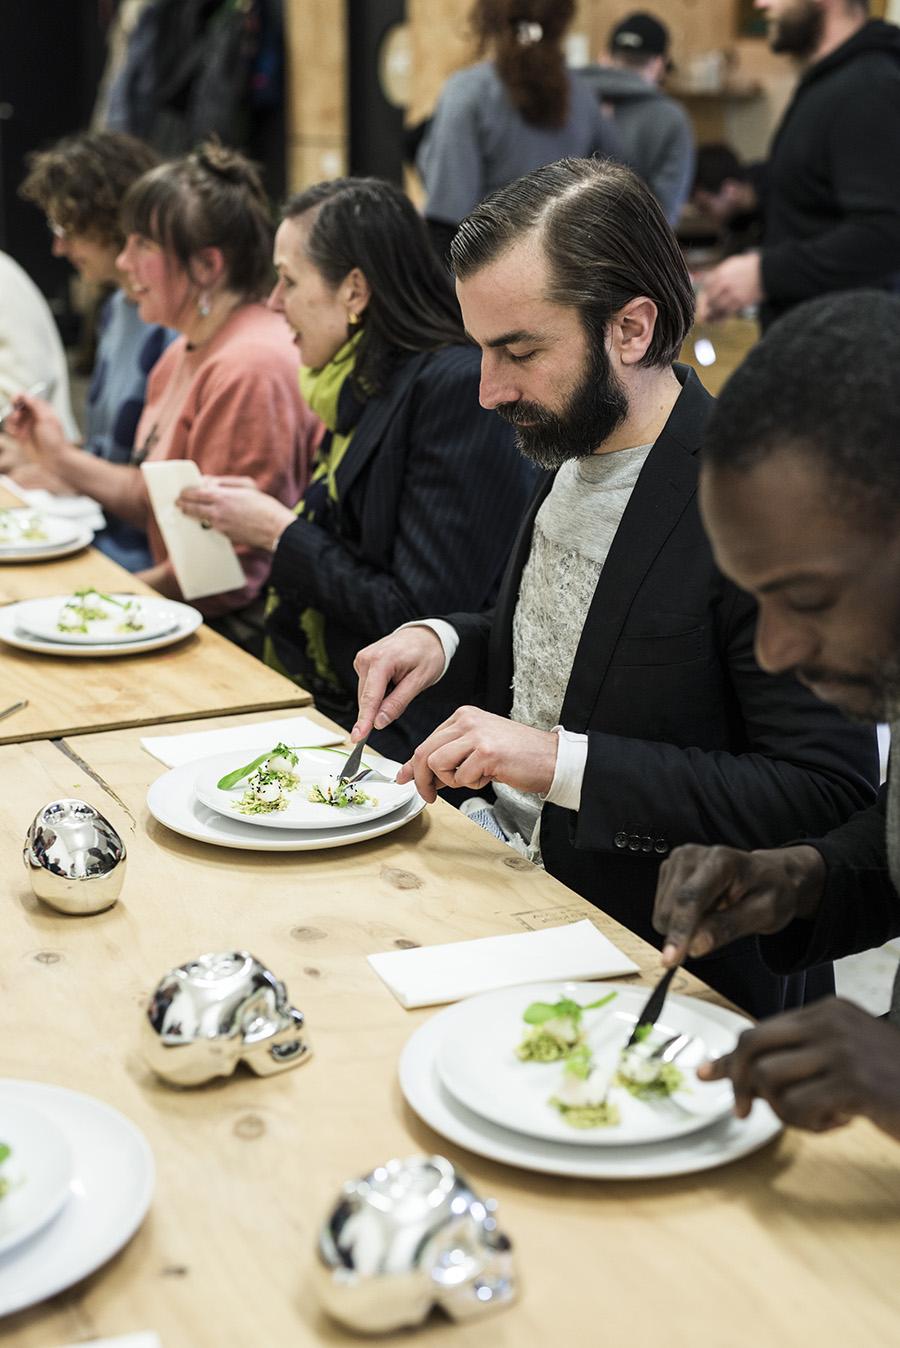 Lab participants dine. Photo: Pheobe Powell.